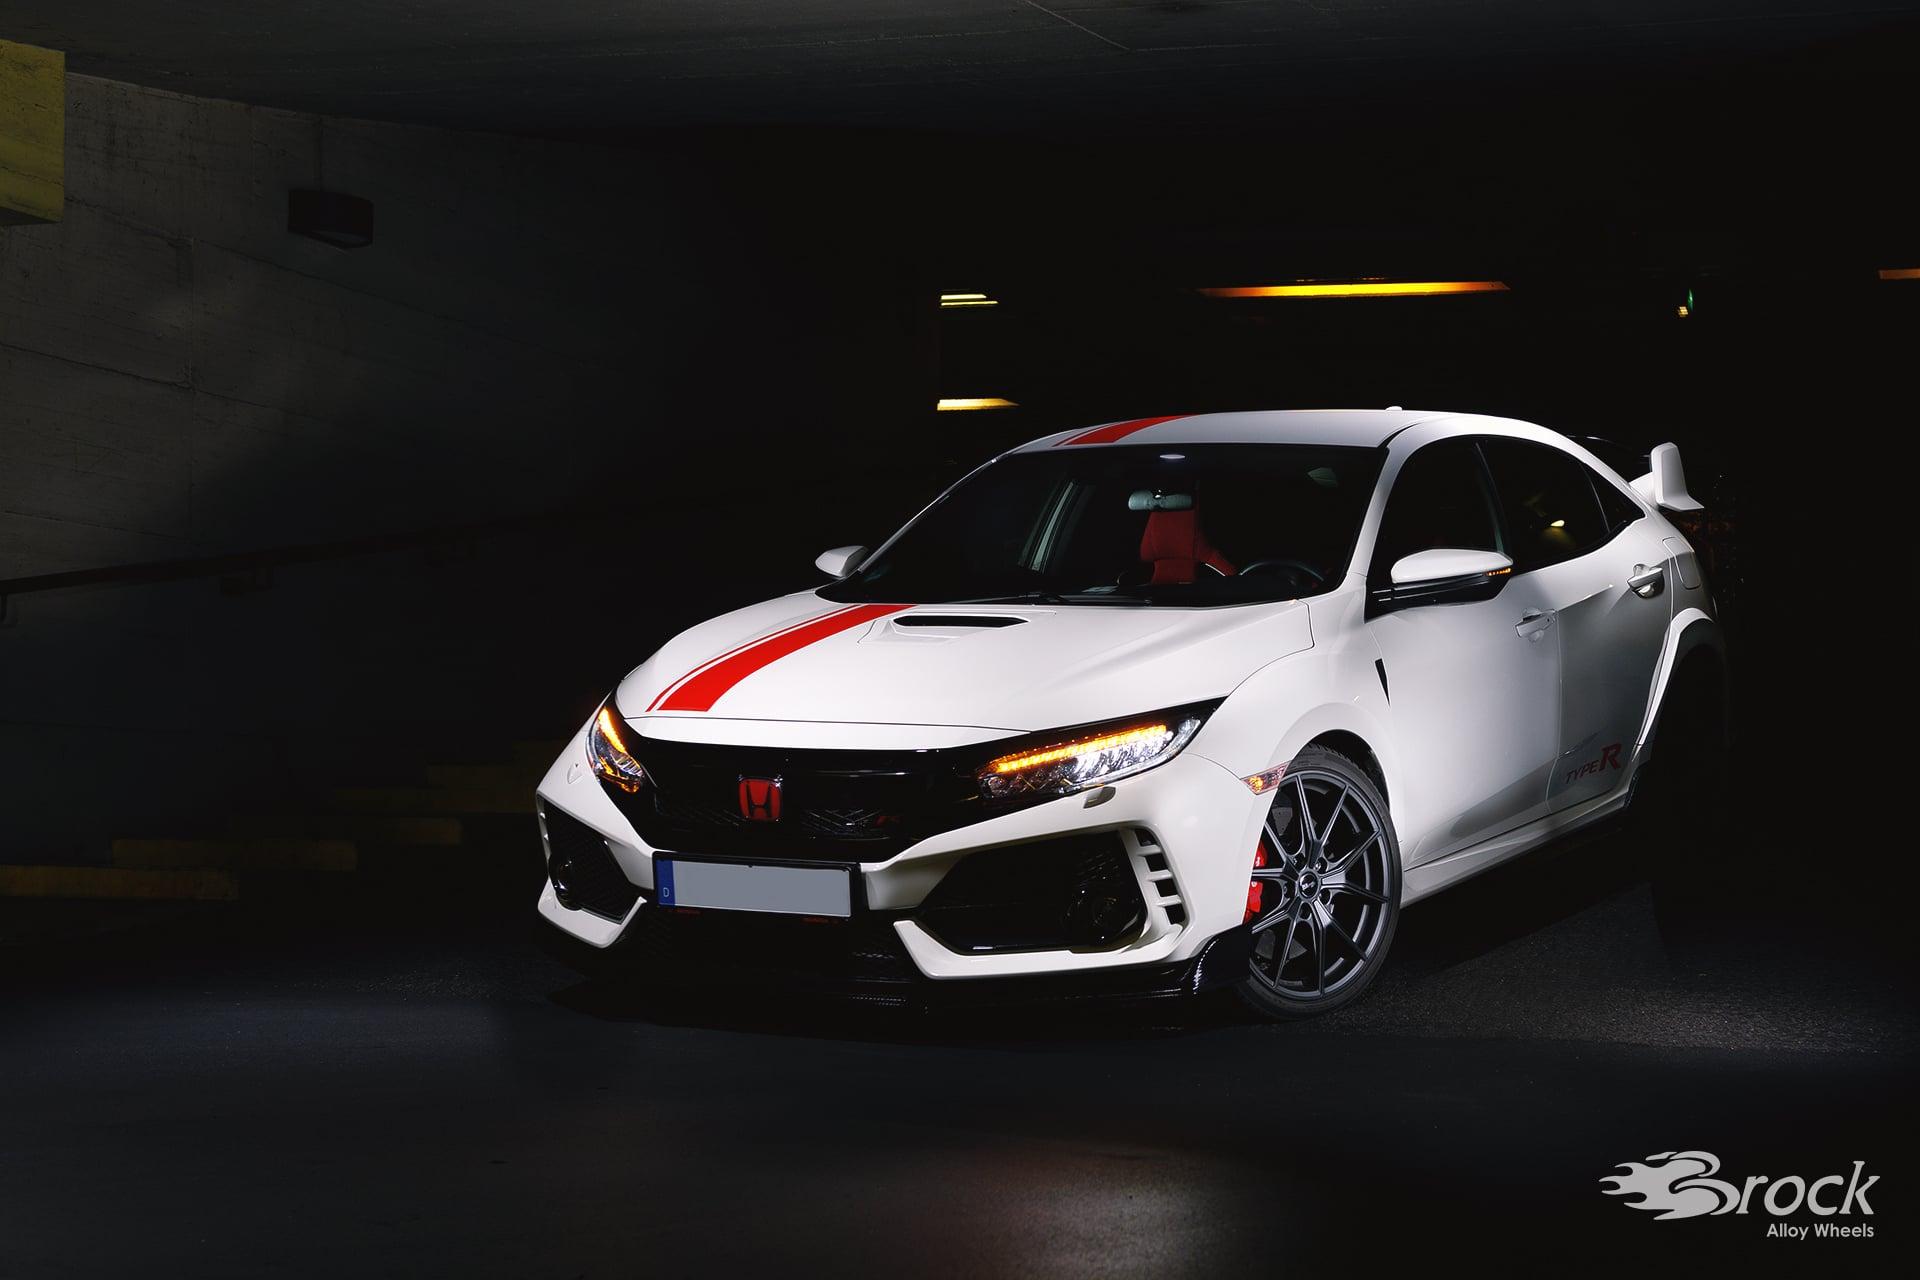 Honda Civic Type-R Brock B40 SBM